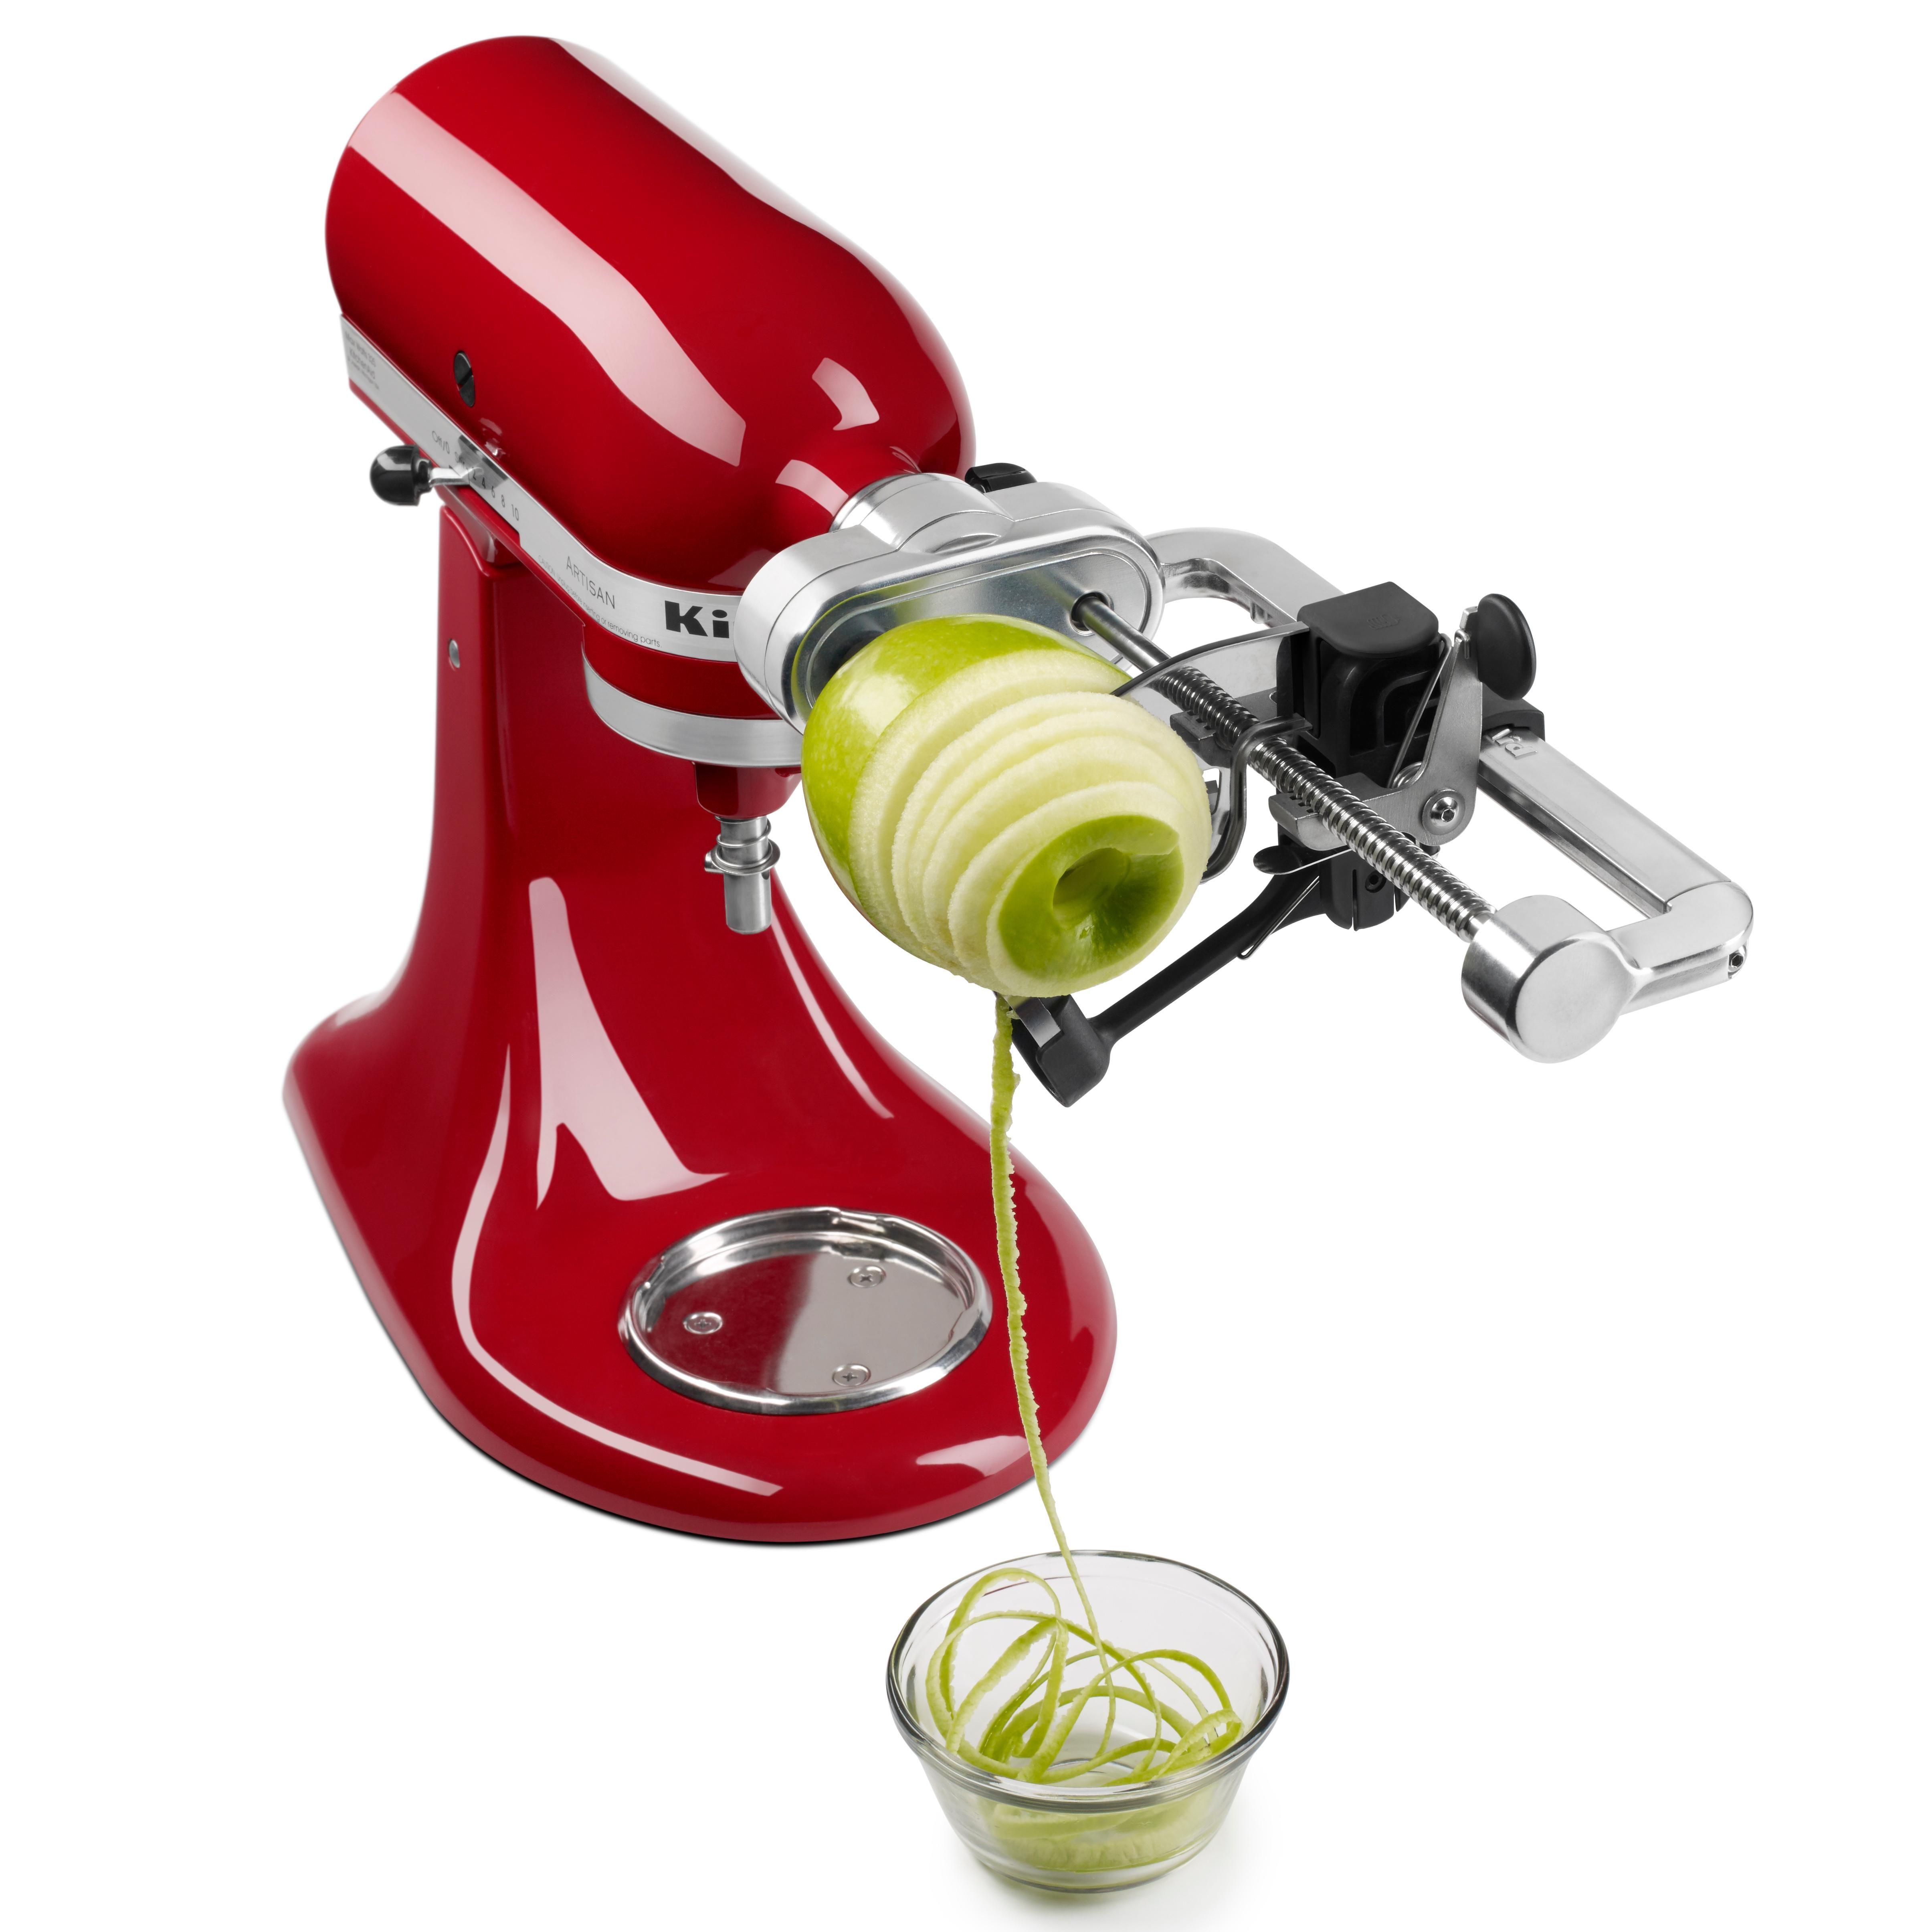 Robot Check Kitchen Aid Attachments Kitchen Aid Mixer Attachments Kitchen Aid Mixer